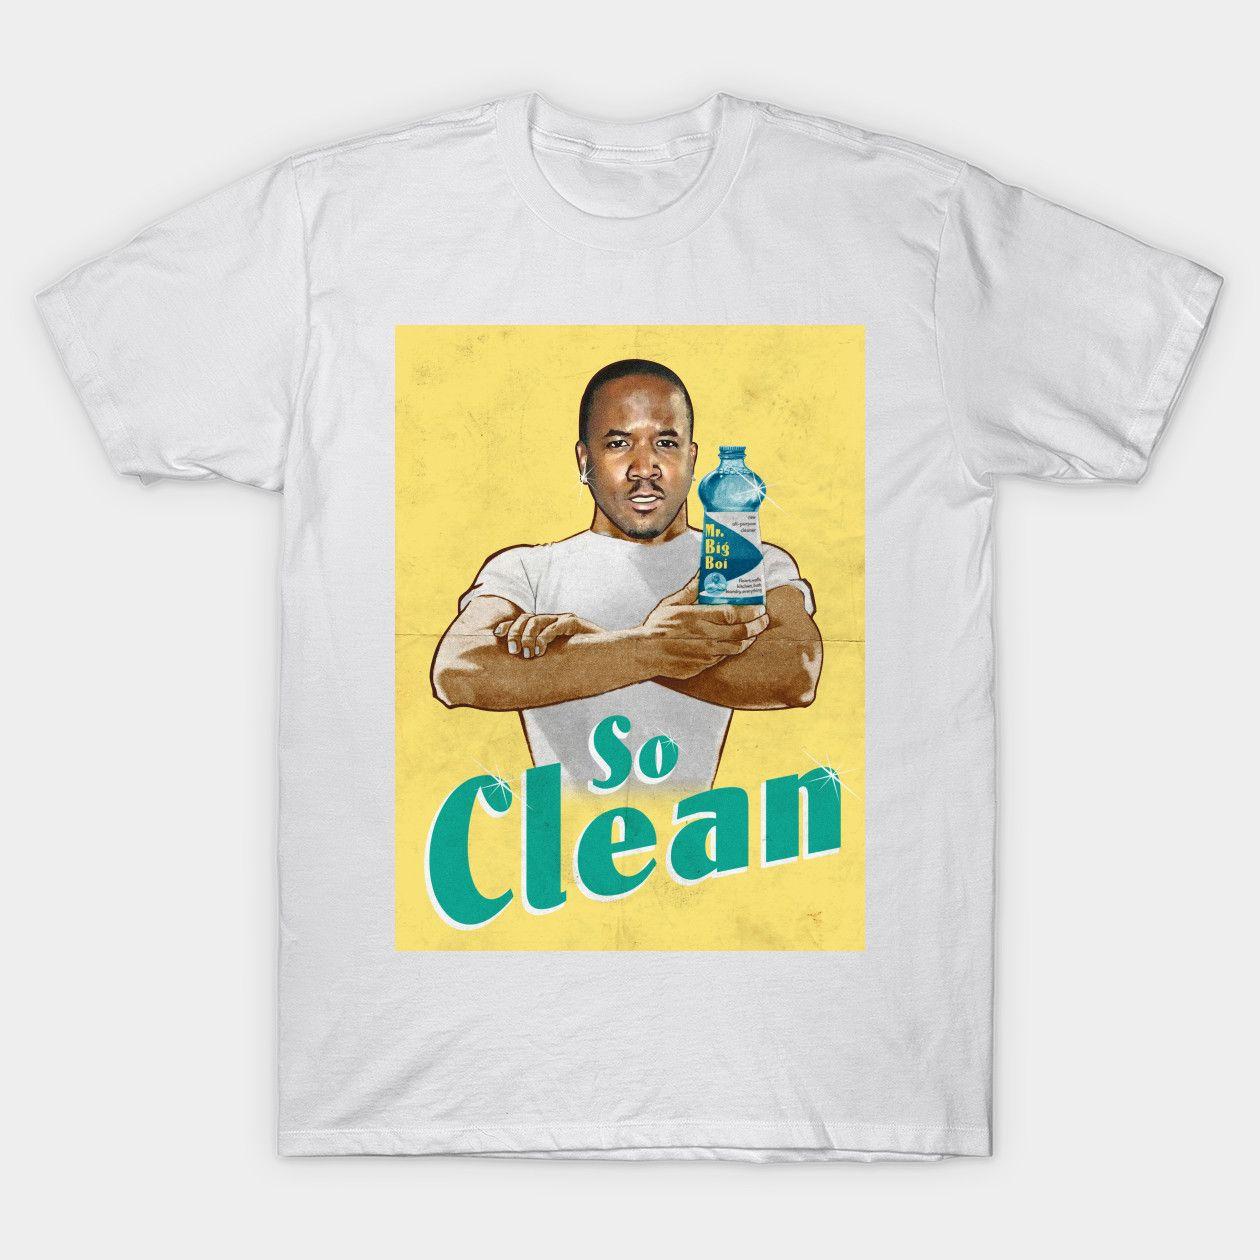 Mr Clean Vintage Ads Classic Shirts